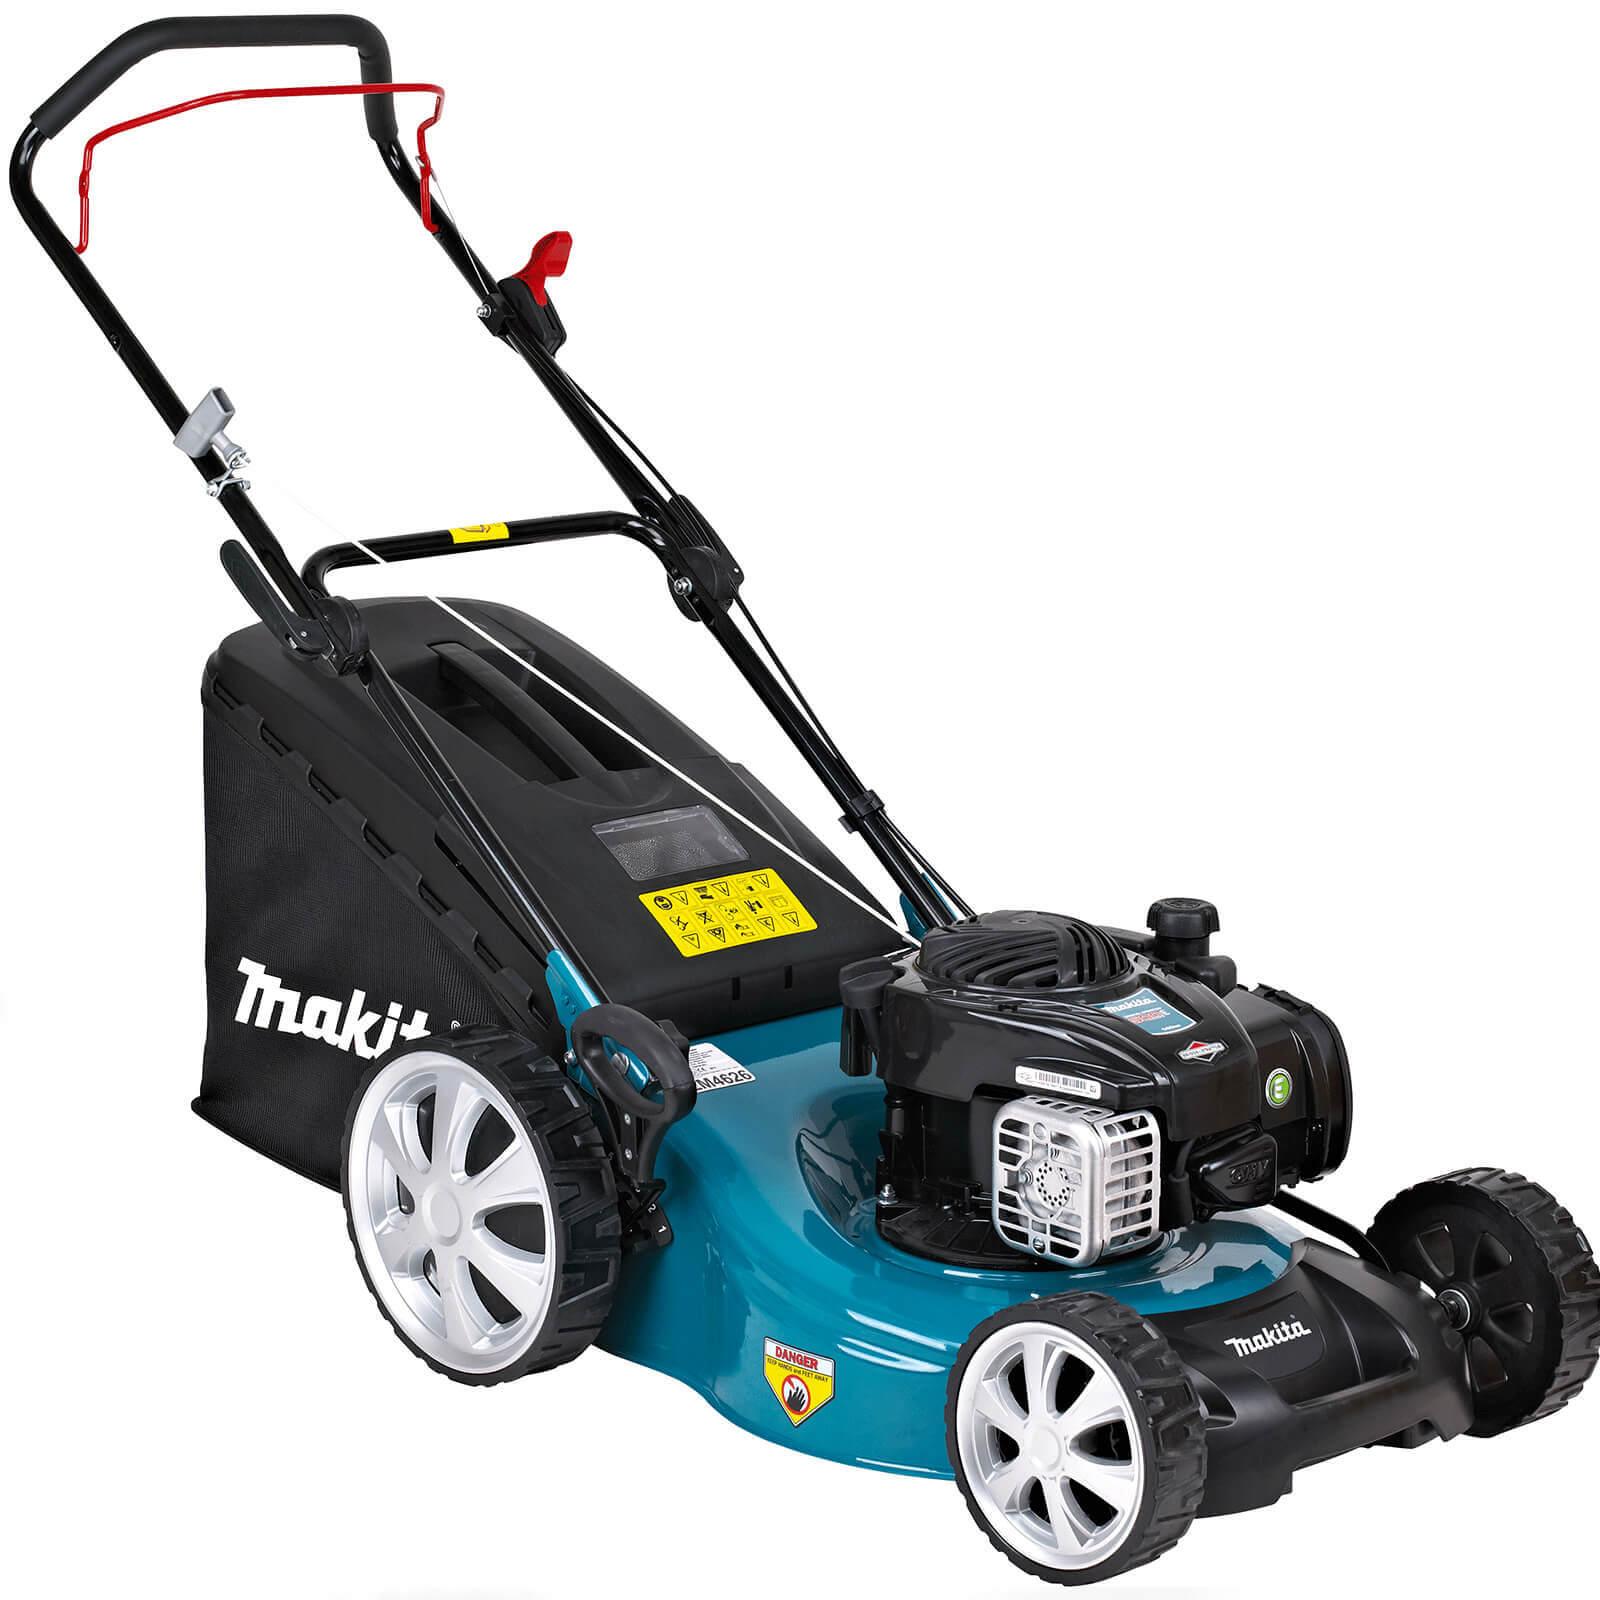 Image of Makita PLM4626N Push Petrol Rotary Lawnmower 460mm